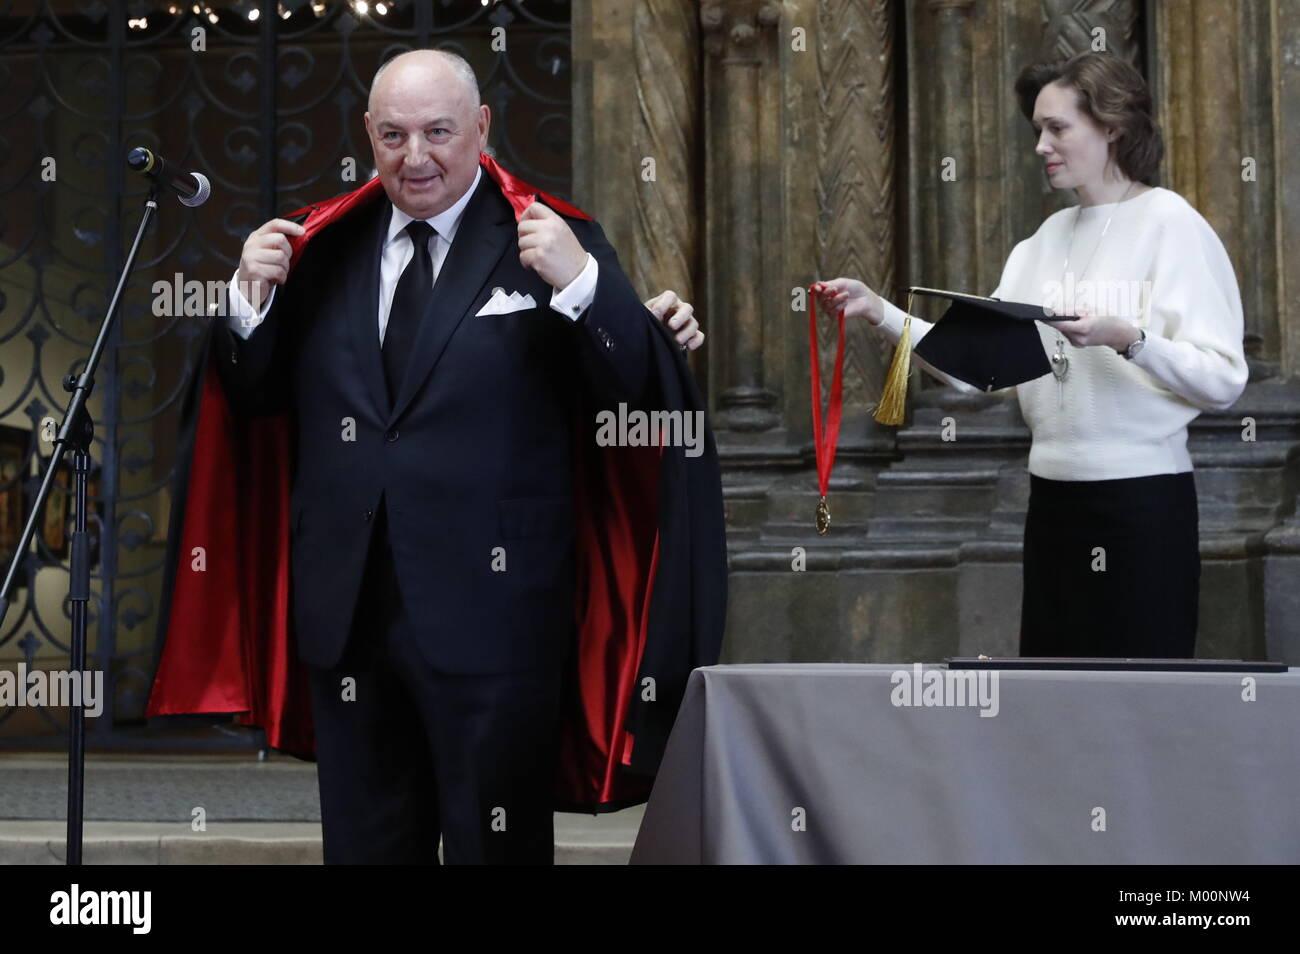 Vyacheslav Kantor now 52